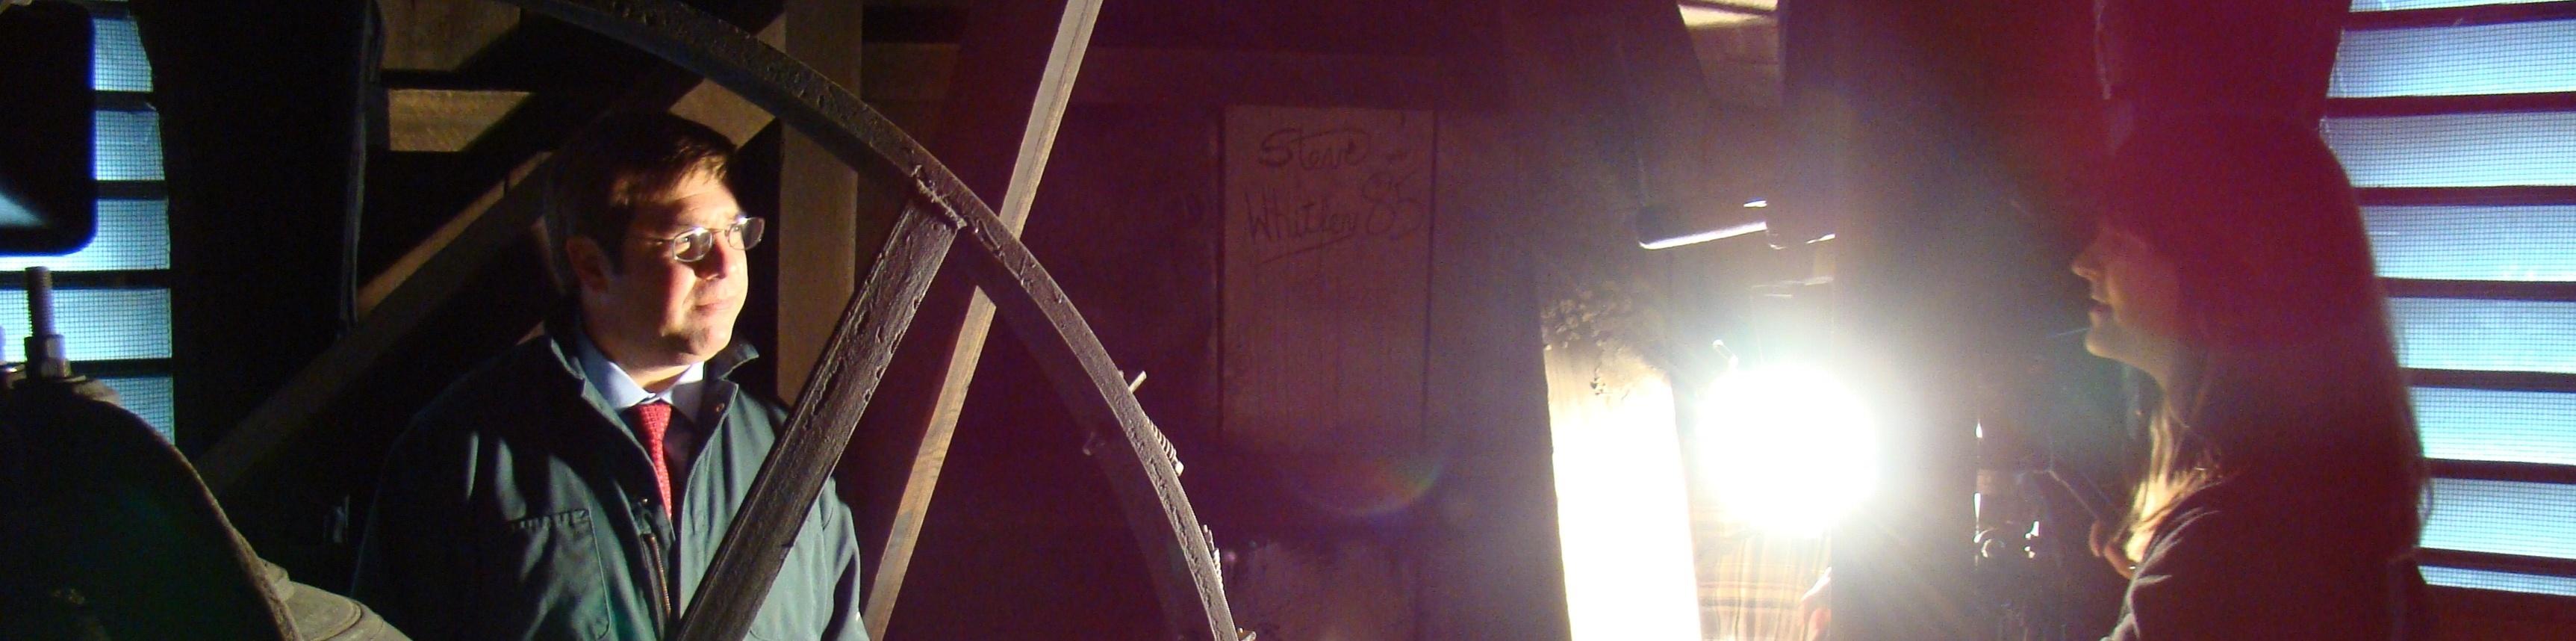 Spotted Yeti Media Video Production Cincinnati Verdin Bell Production Image